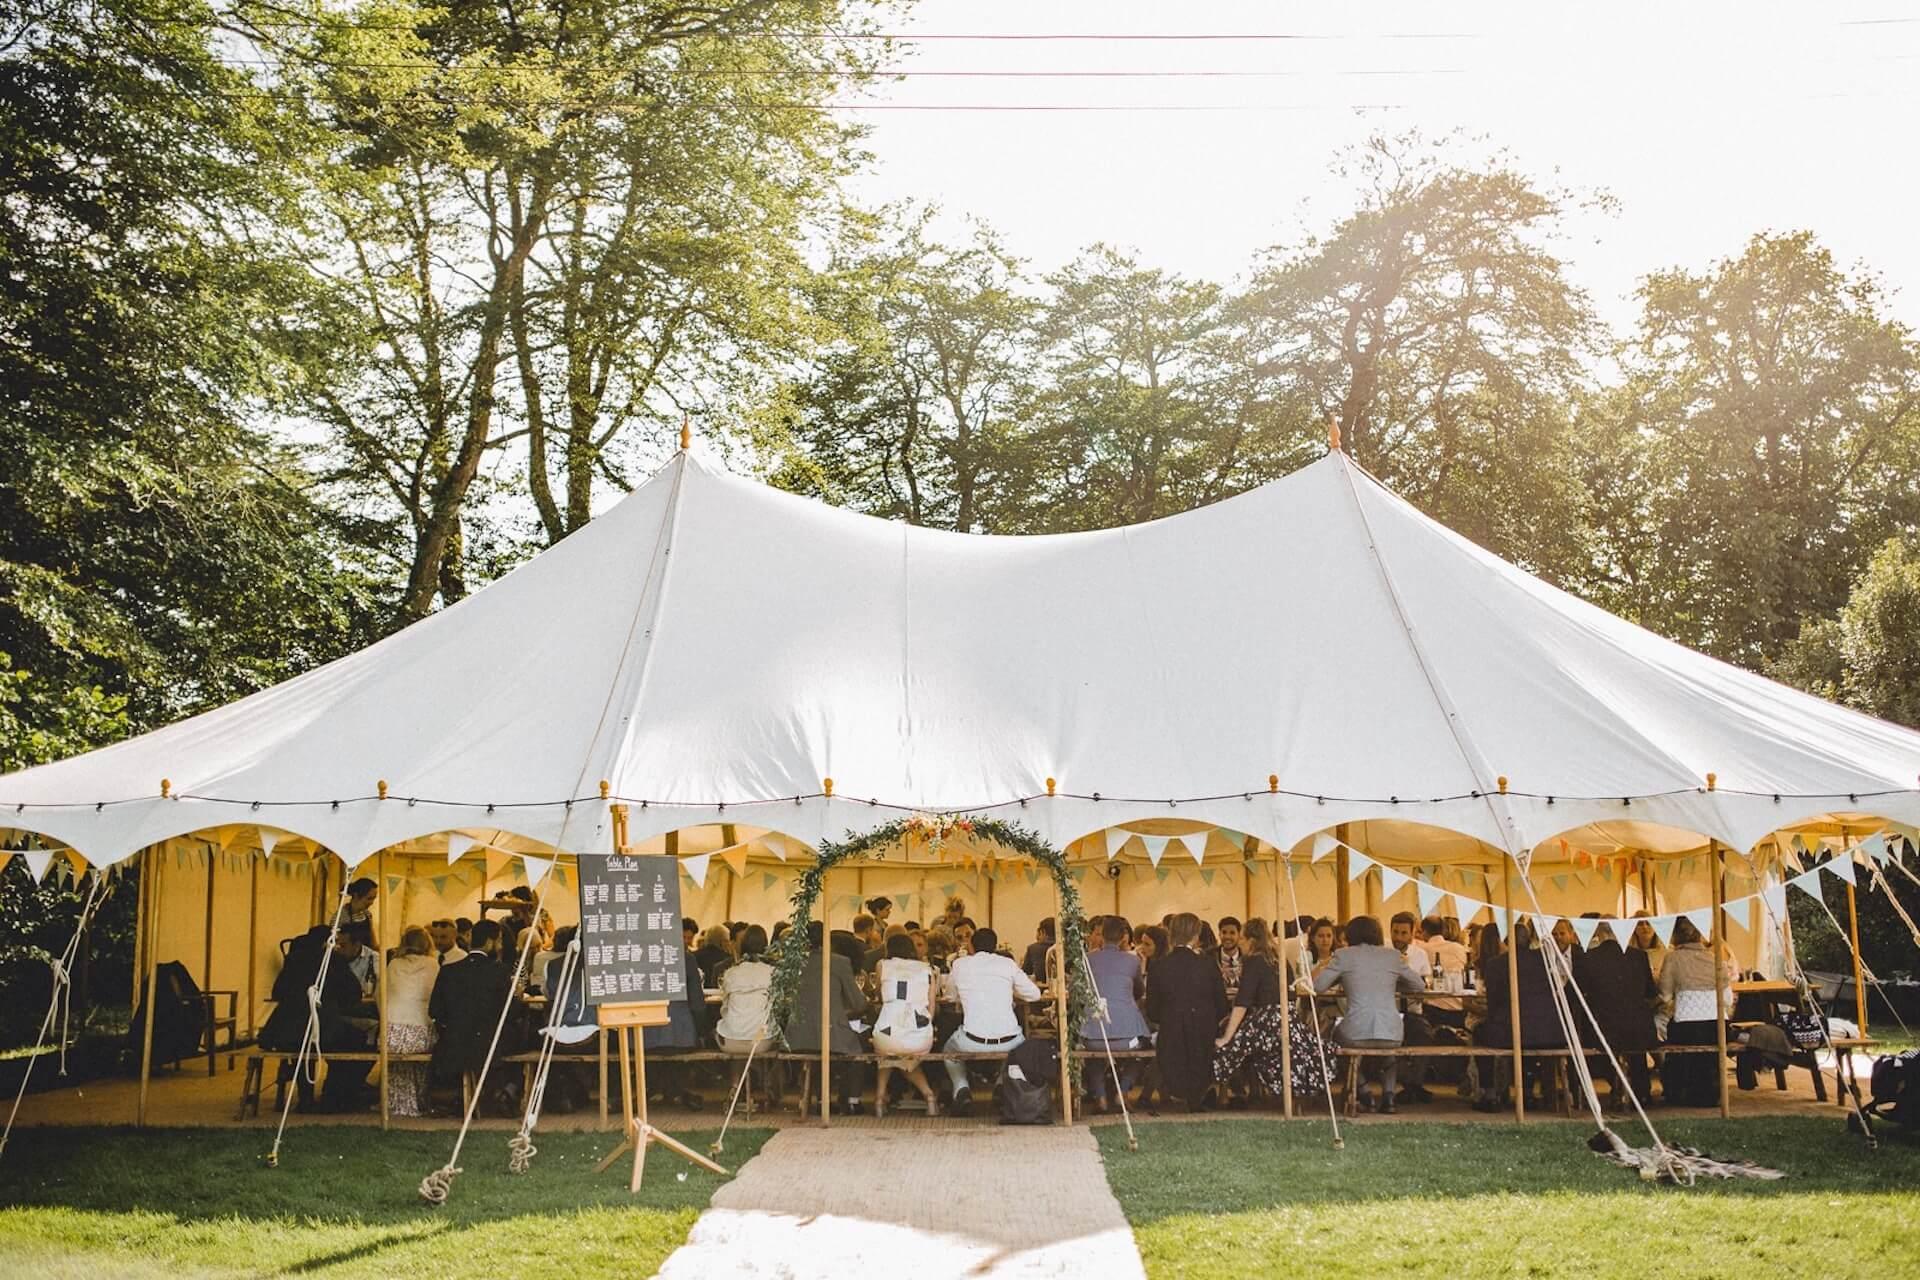 Wedding marquee hire Cornwall